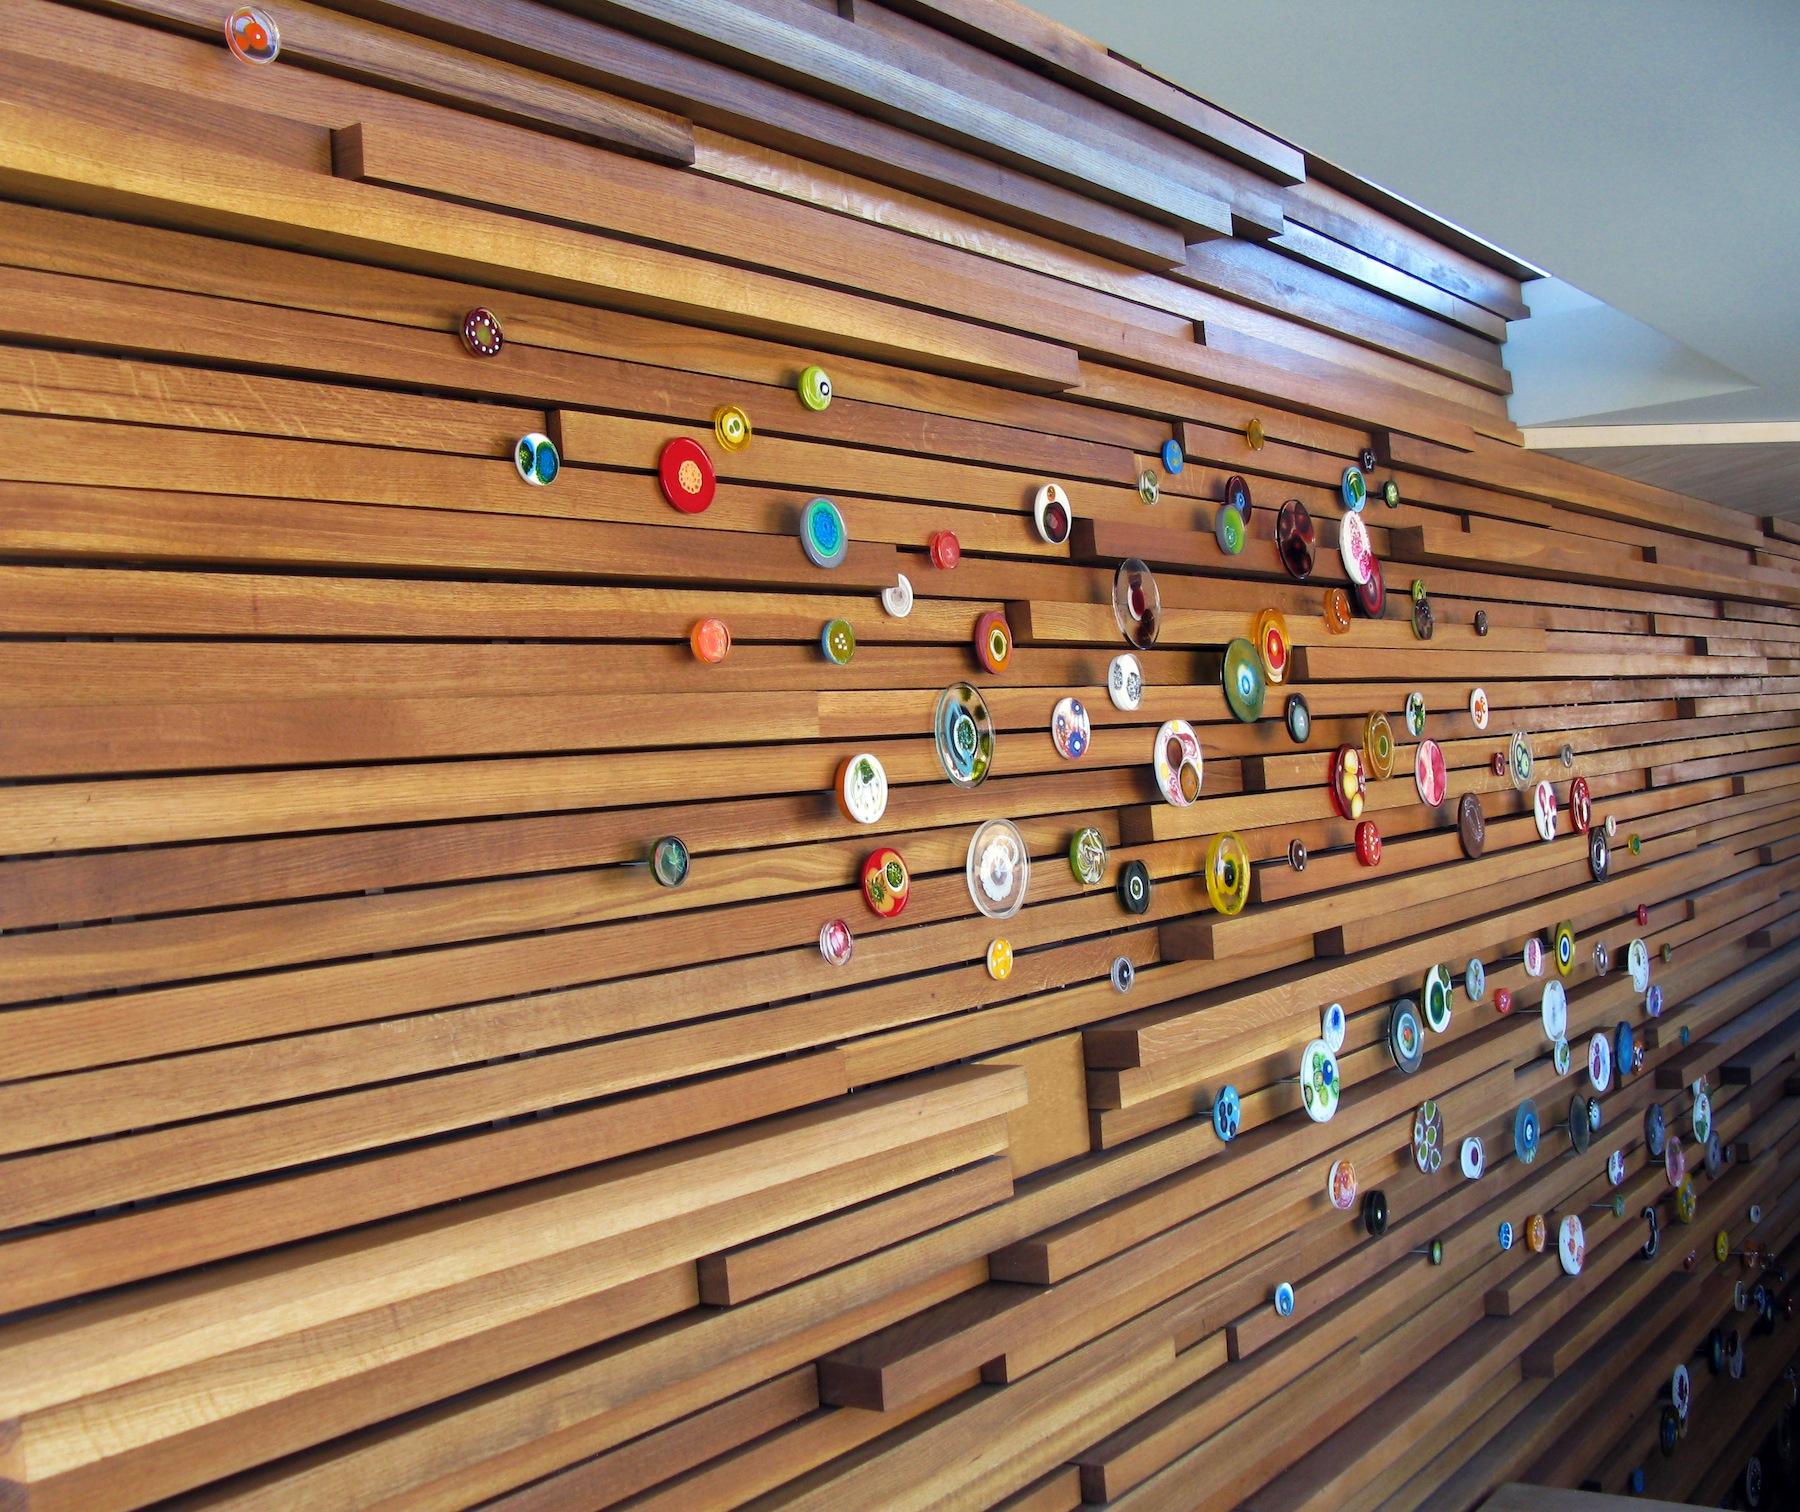 Artwork by Klari Reis.  Petri dish painting residential installation.